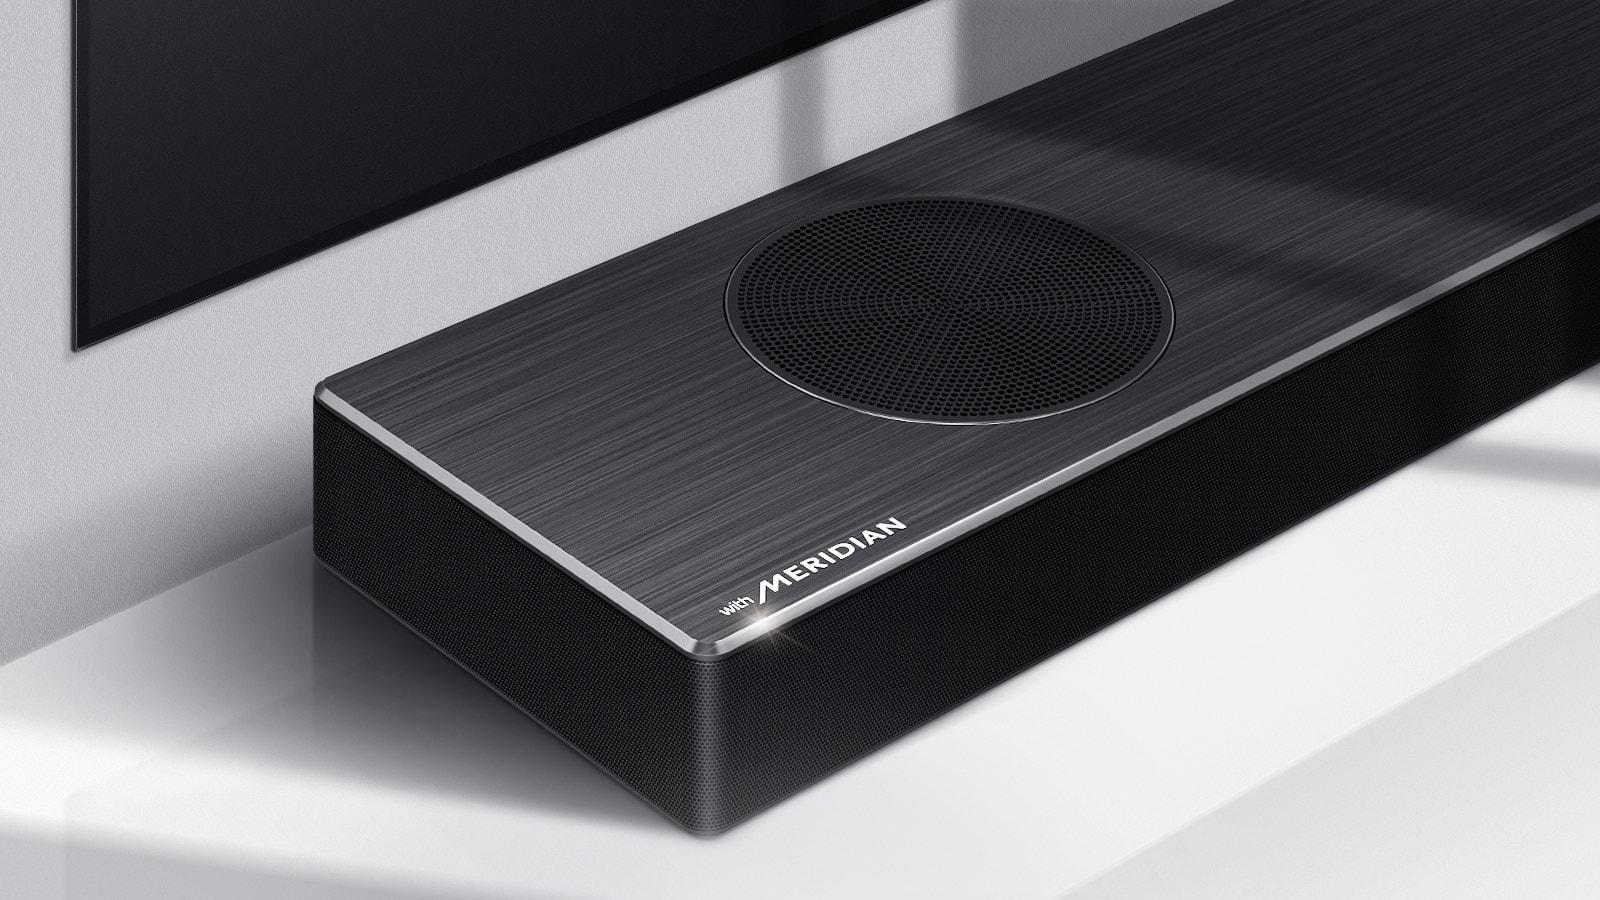 https://www.lg.com/sg/images/home-audio/md07528051/feature/SP9YA_Home_audio-05-Meridian-Desktop.jpg